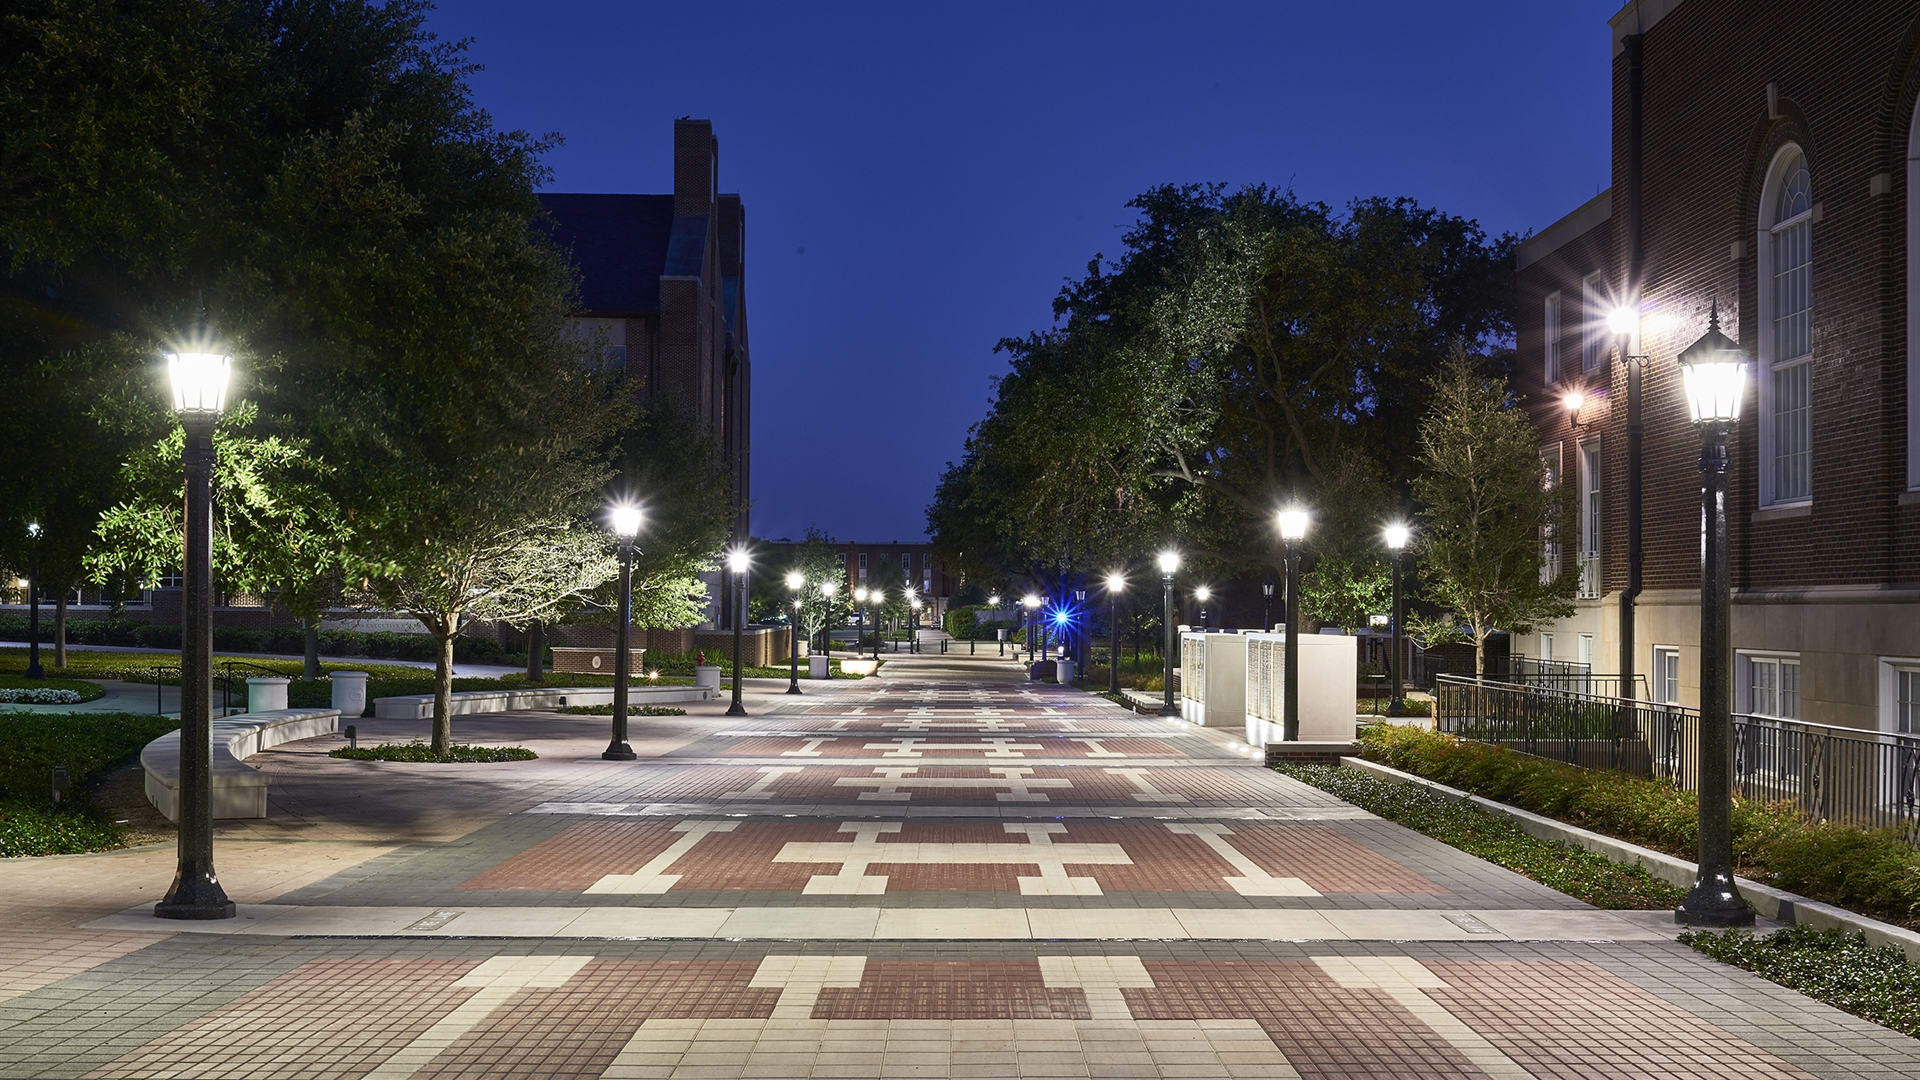 SMU – Crain Family Centennial Promenade